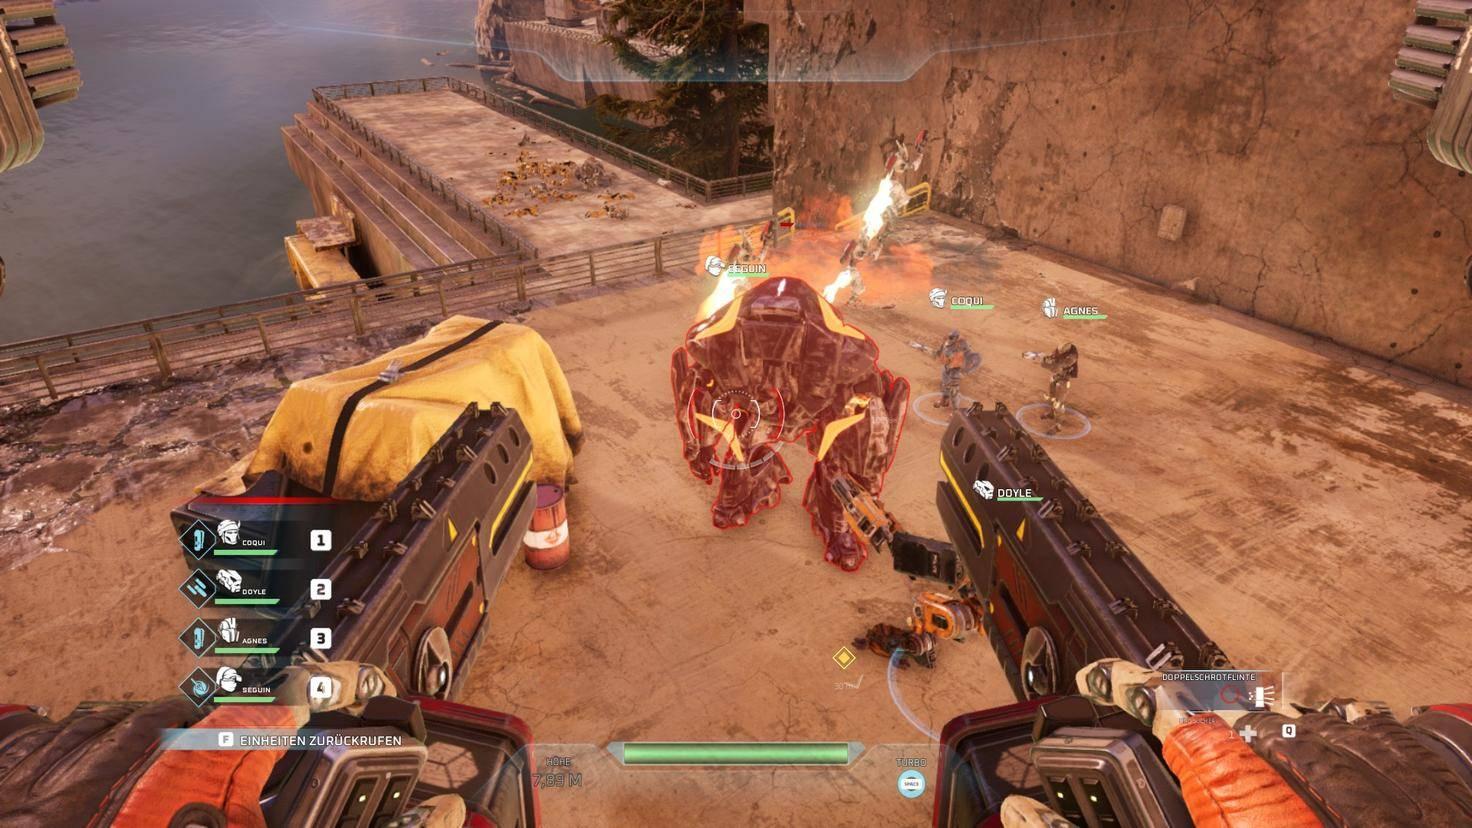 disintegration-screenshot (4)